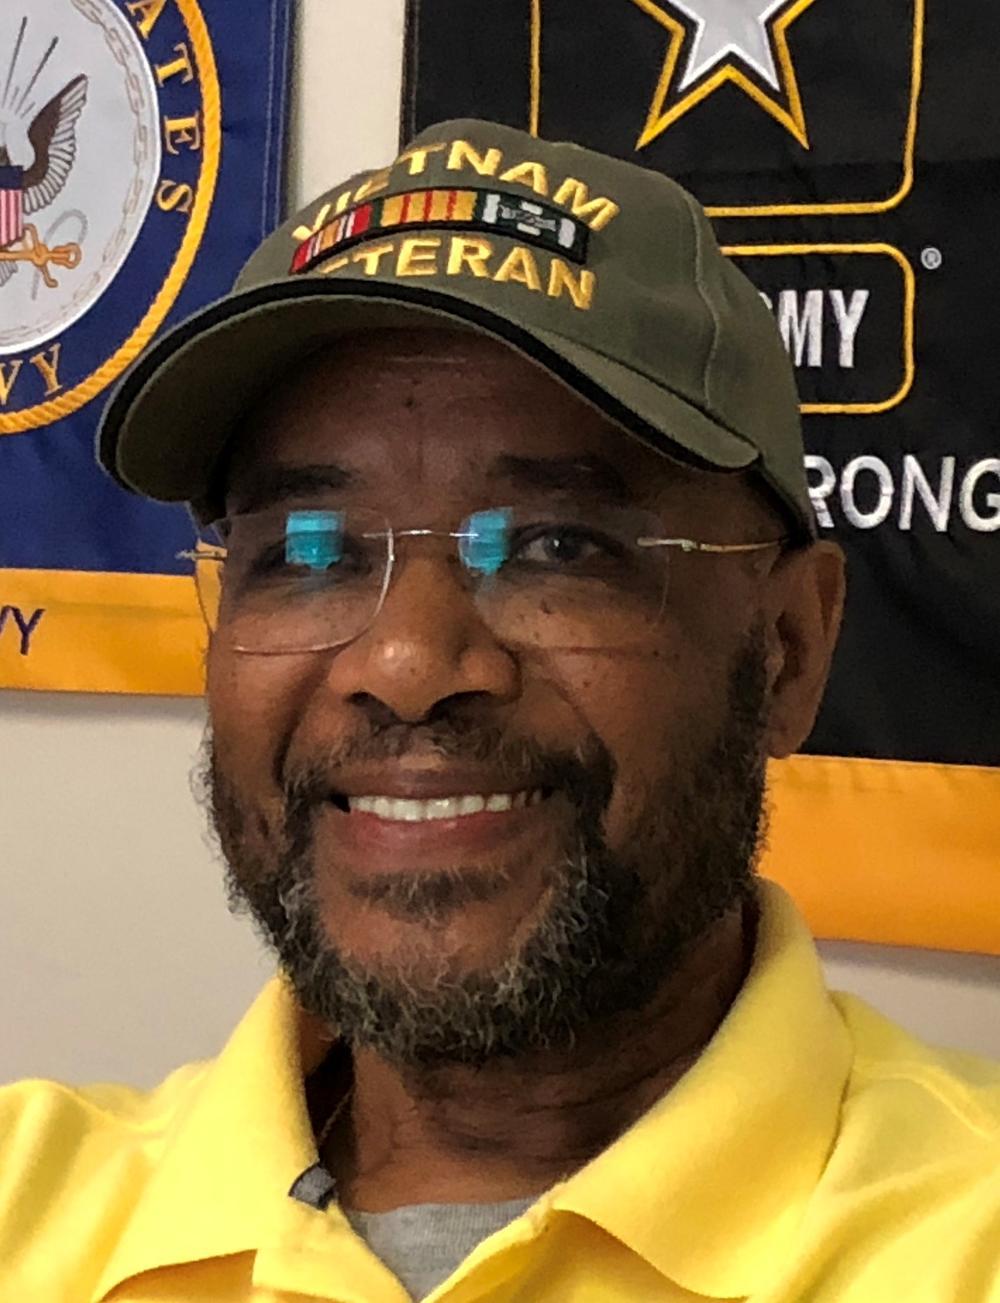 Hilton, Honored Veteran